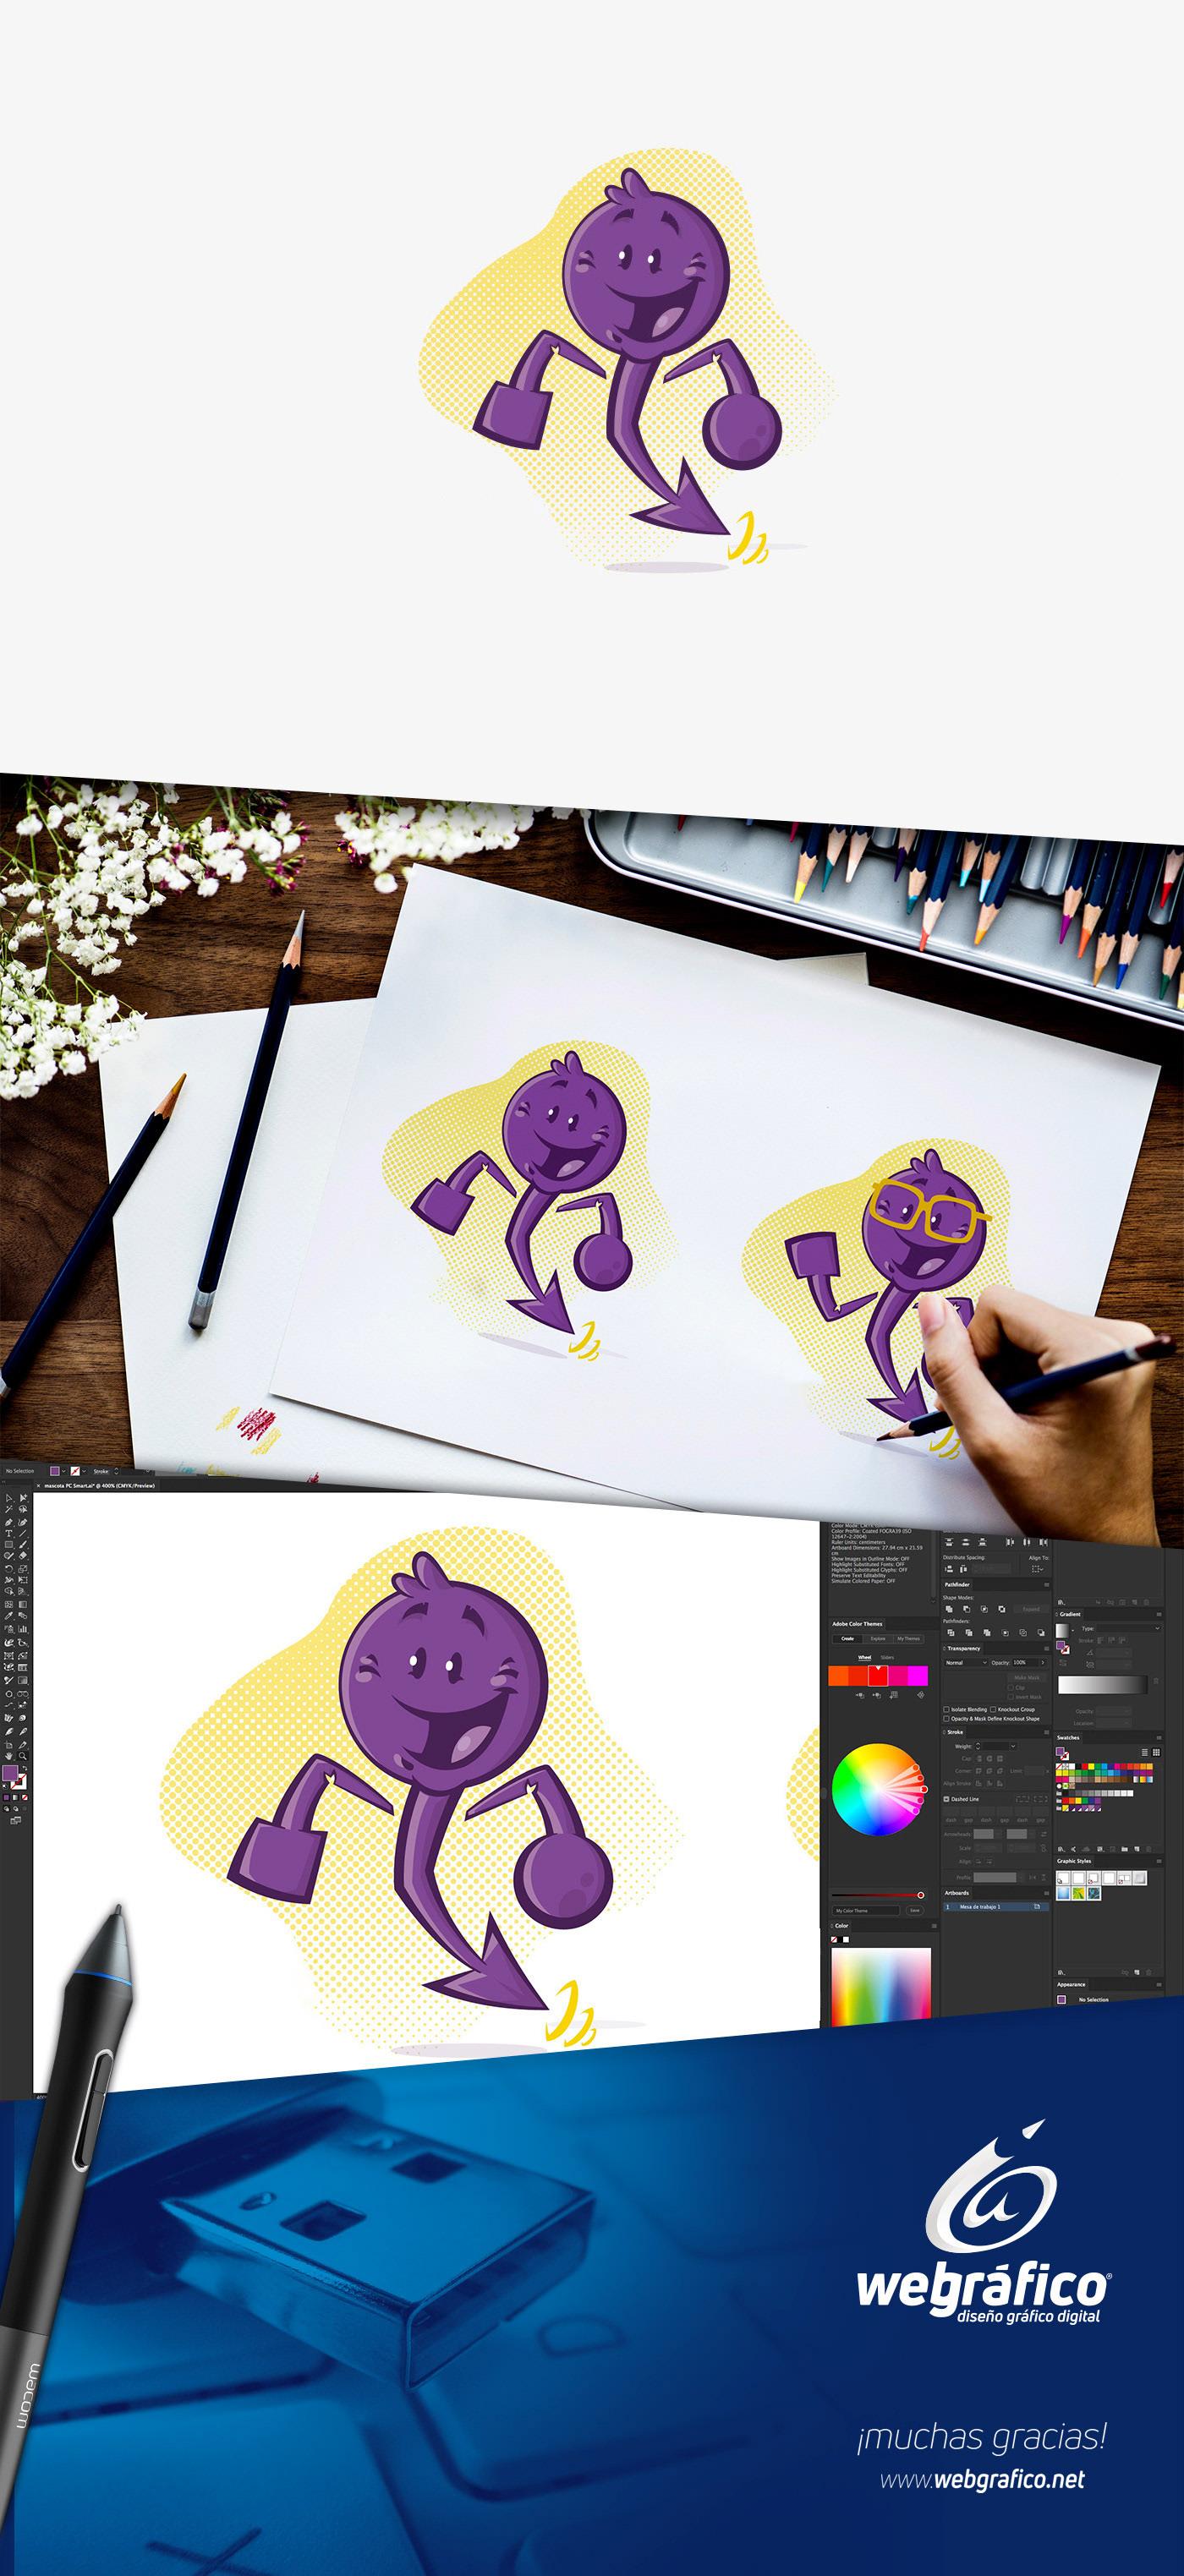 Mascota webgrafico ilustracion miguel colunga mexico pc smart corporate mascot